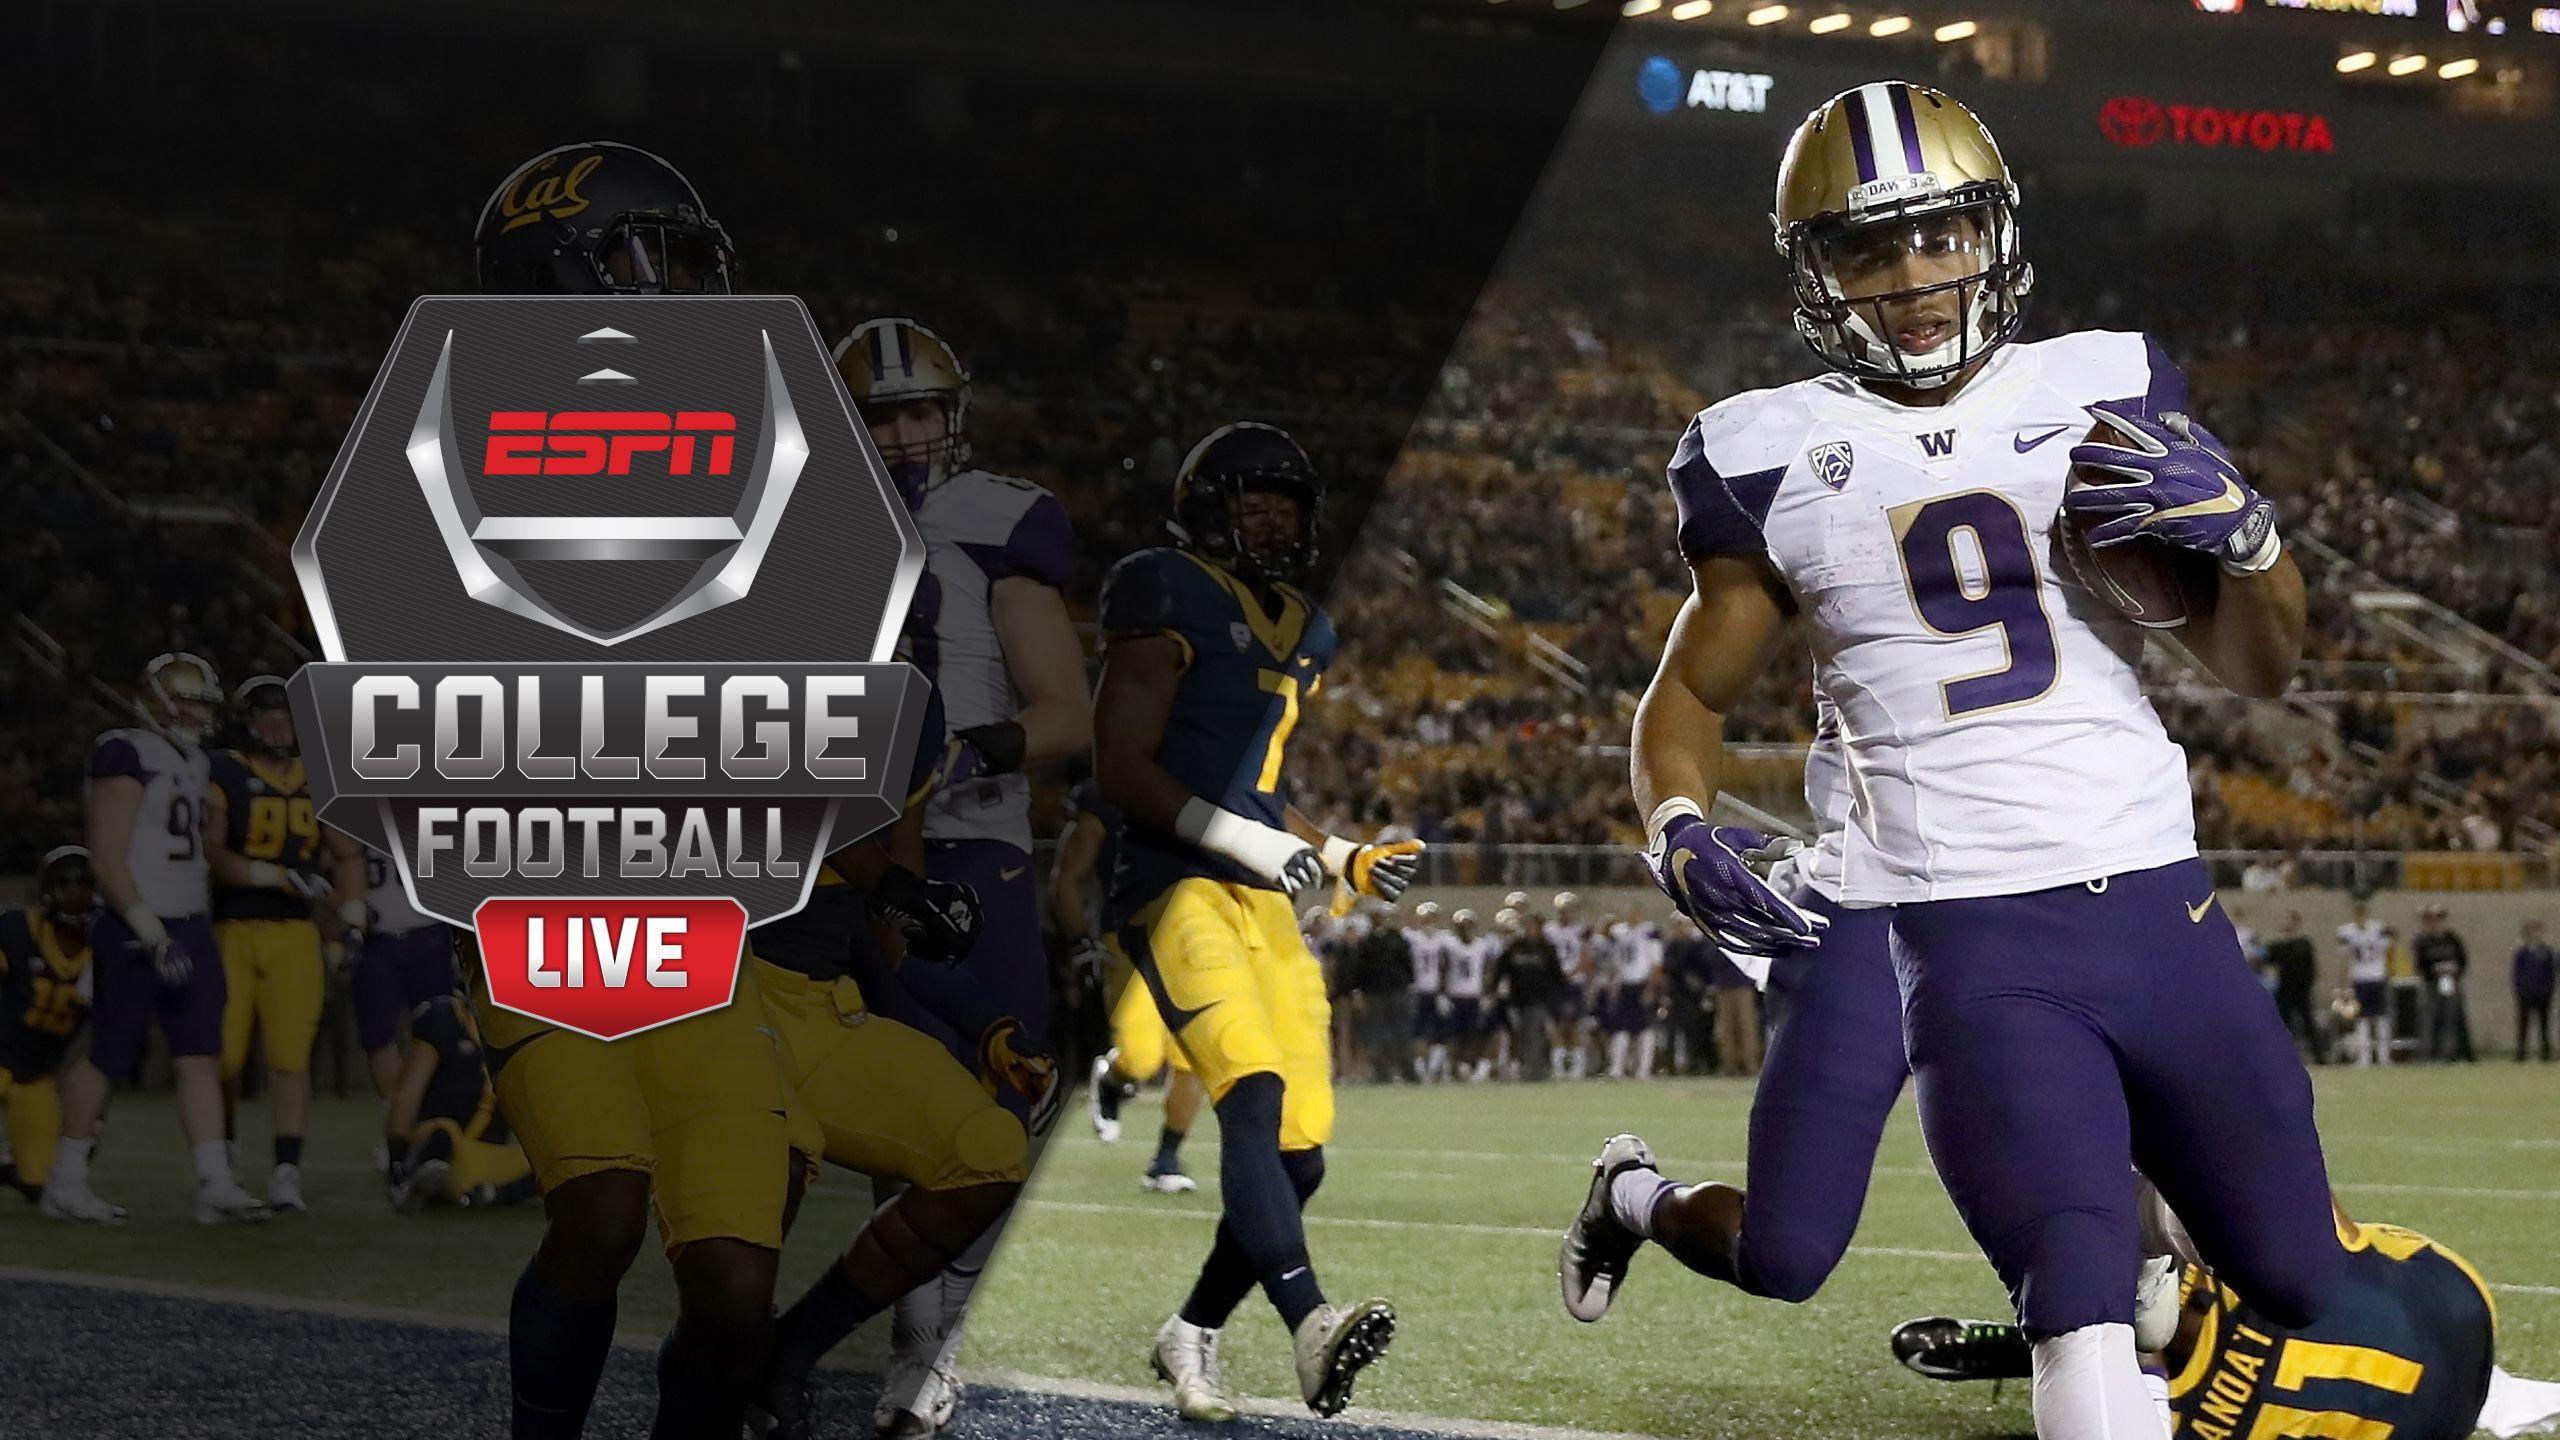 cfb championship espn live college football scores